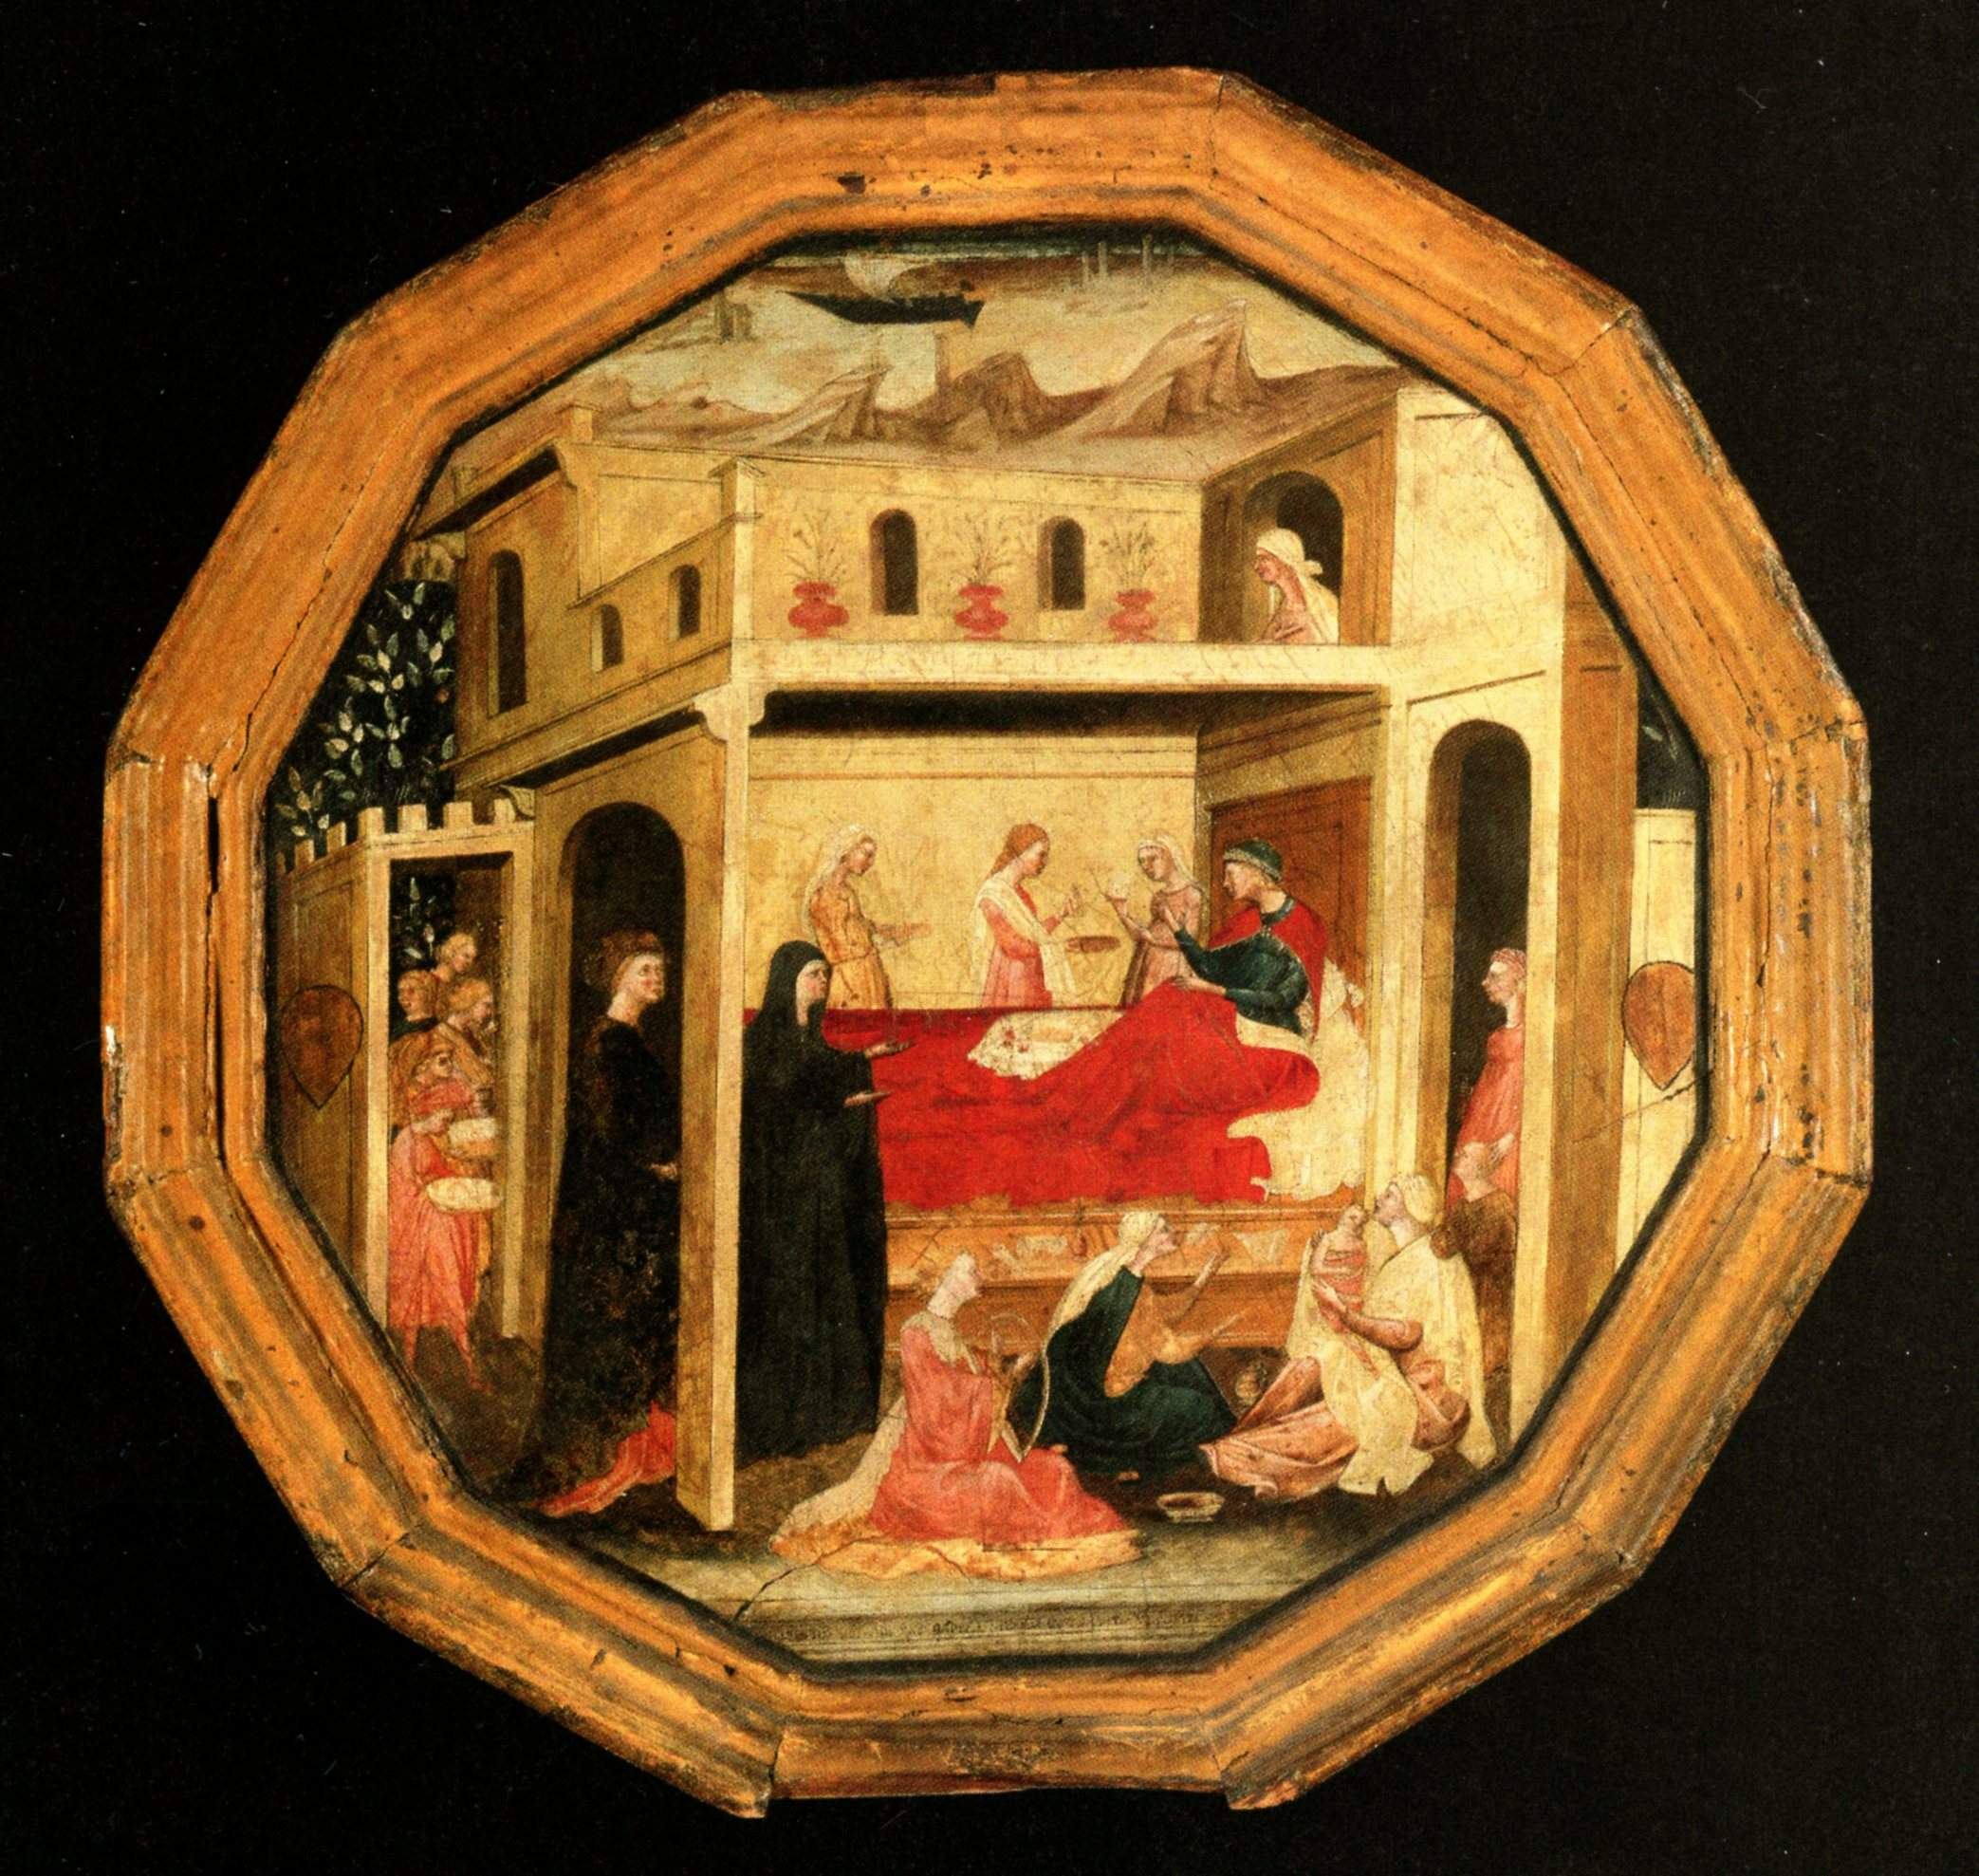 Bartolomeo Fruosino, desco da parto, 1420, Coll Privée (2)